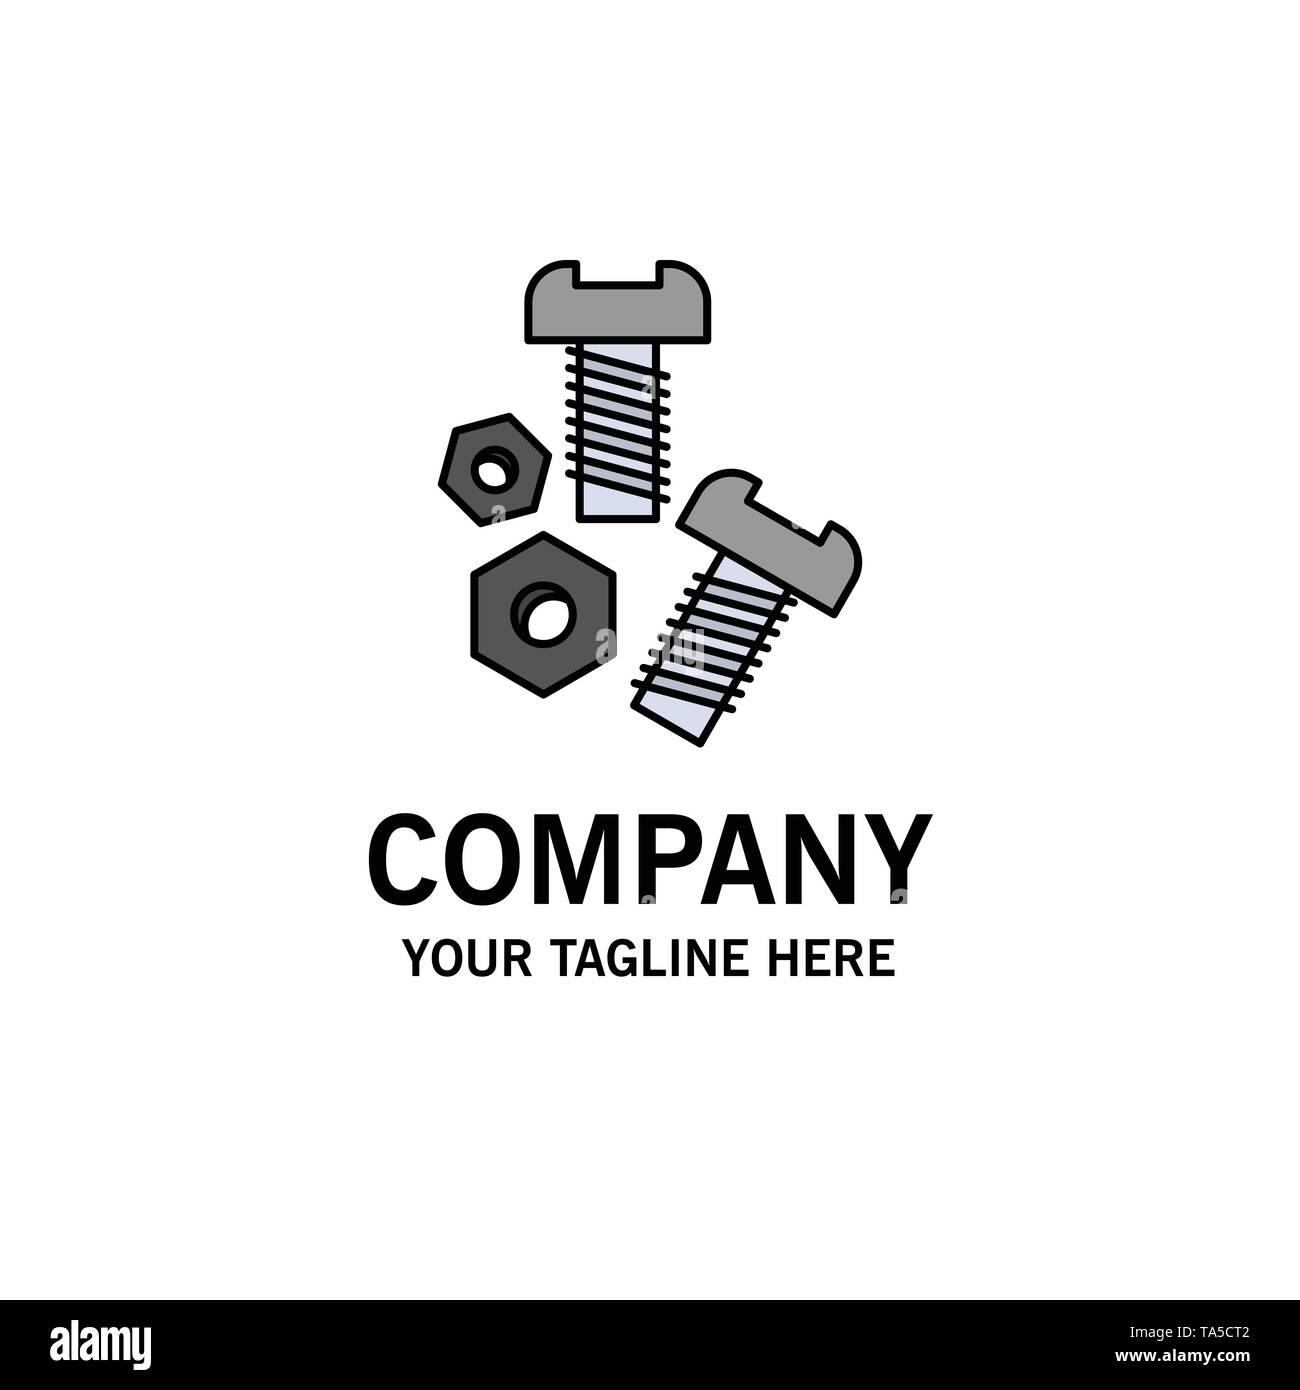 Bolt Nut Screw Tools Business Logo Template Flat Color Stock Vector Image Art Alamy